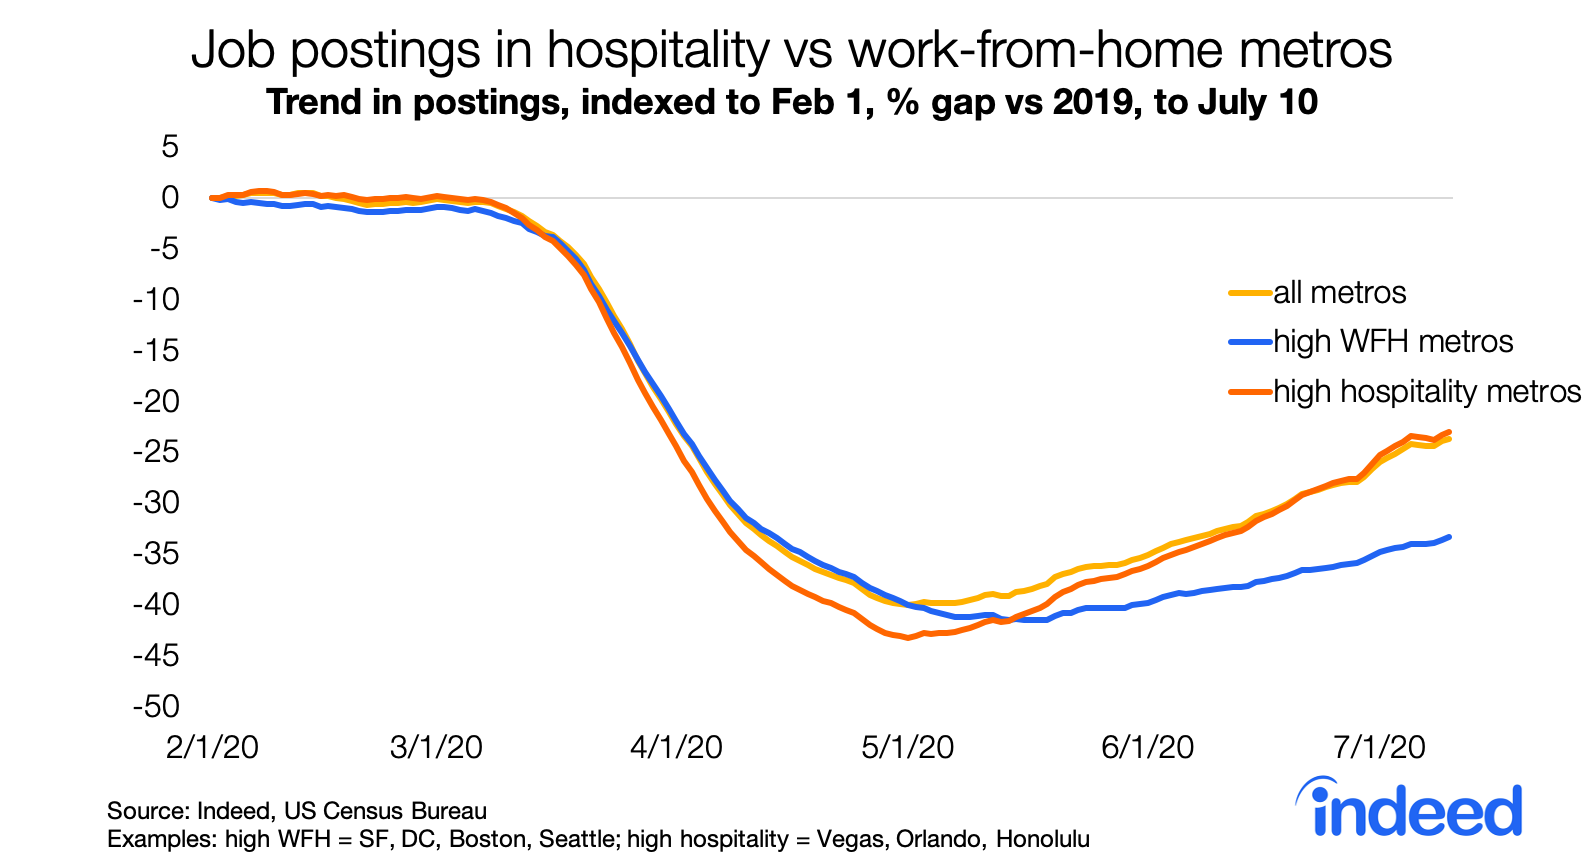 Job postings in hospitality vs work from home metros